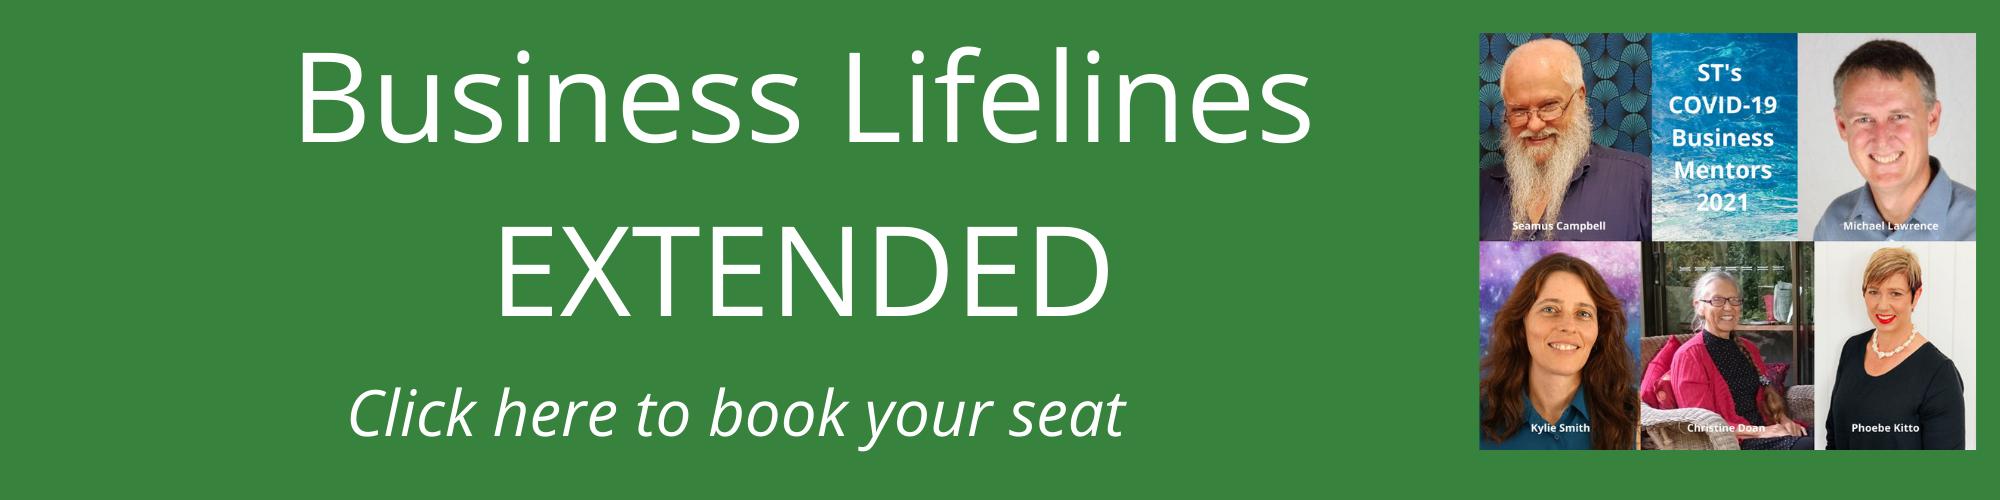 Business-Lifeline-Extended